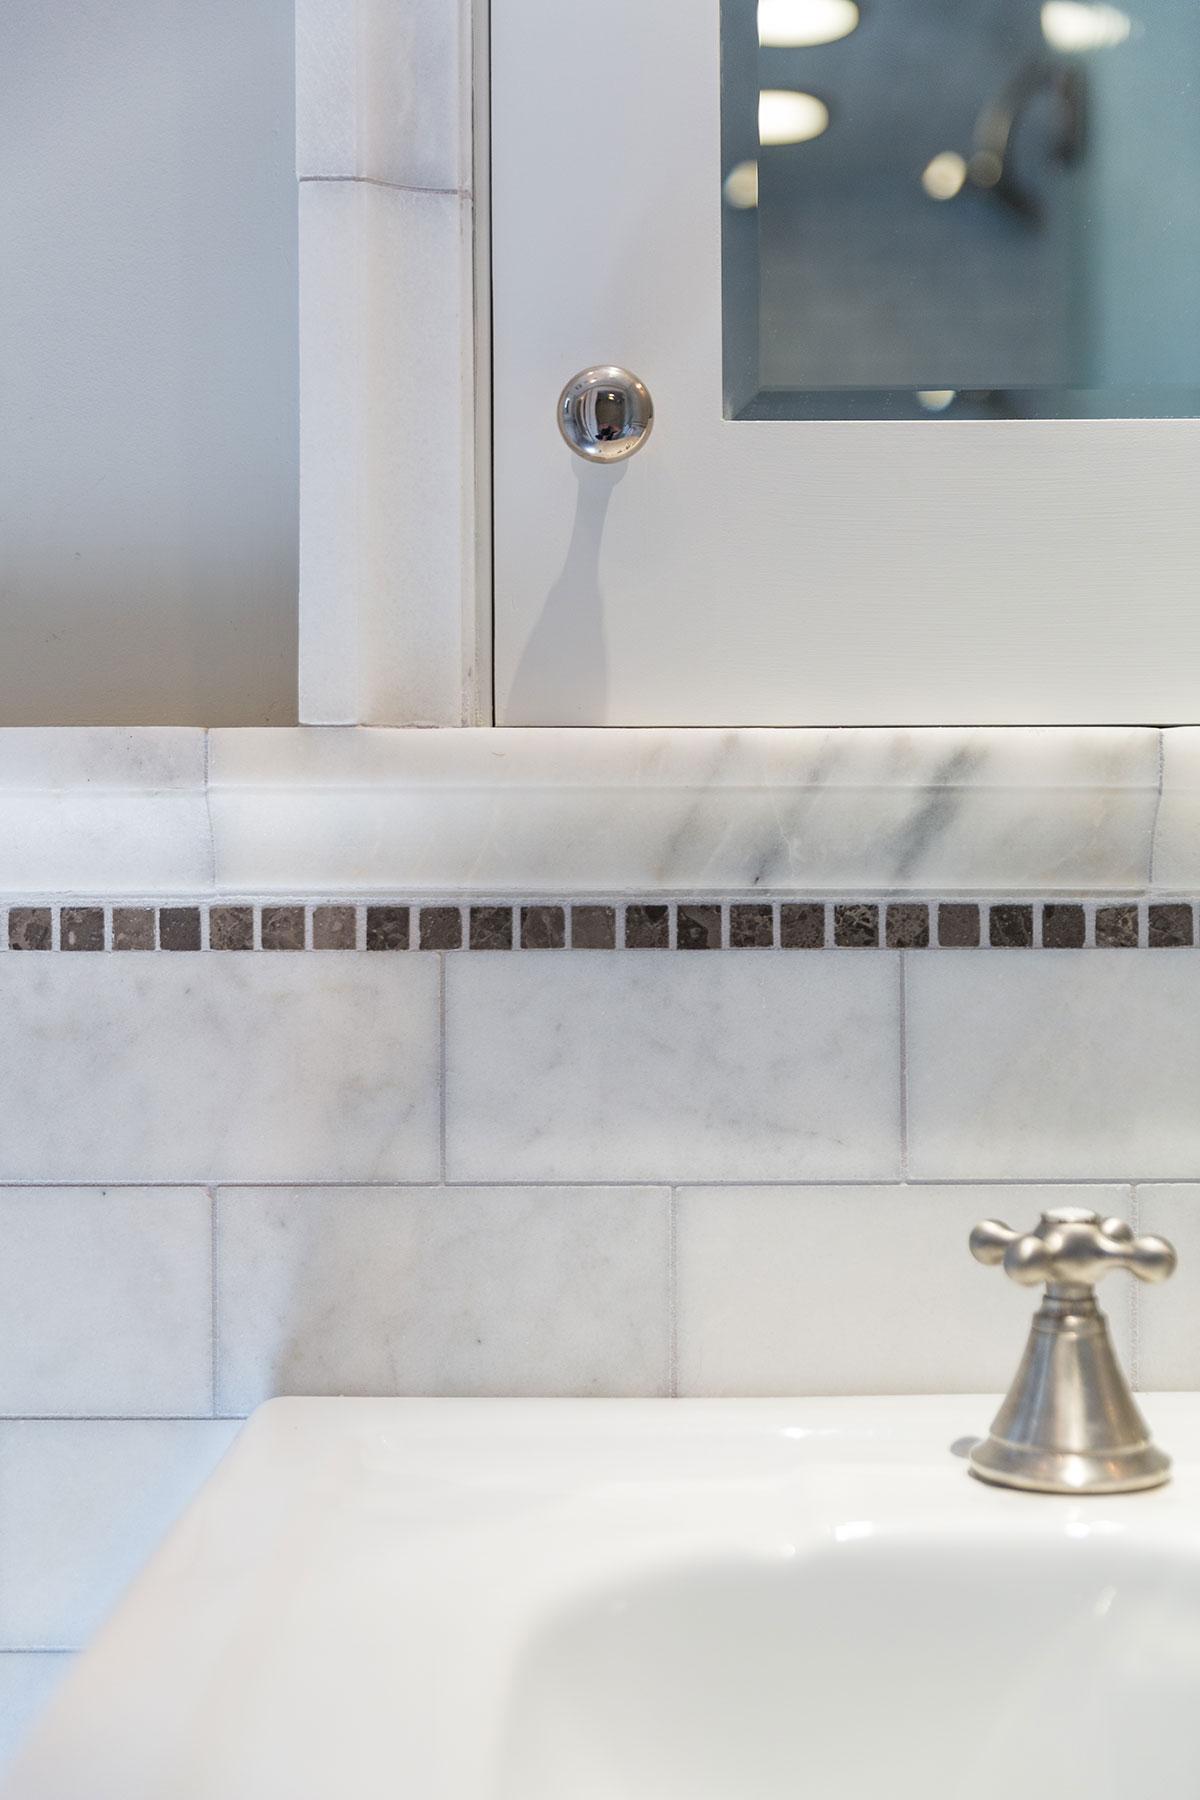 Clark Mansion Alameda Bath Faucet with Tile Detail Buestad Construction